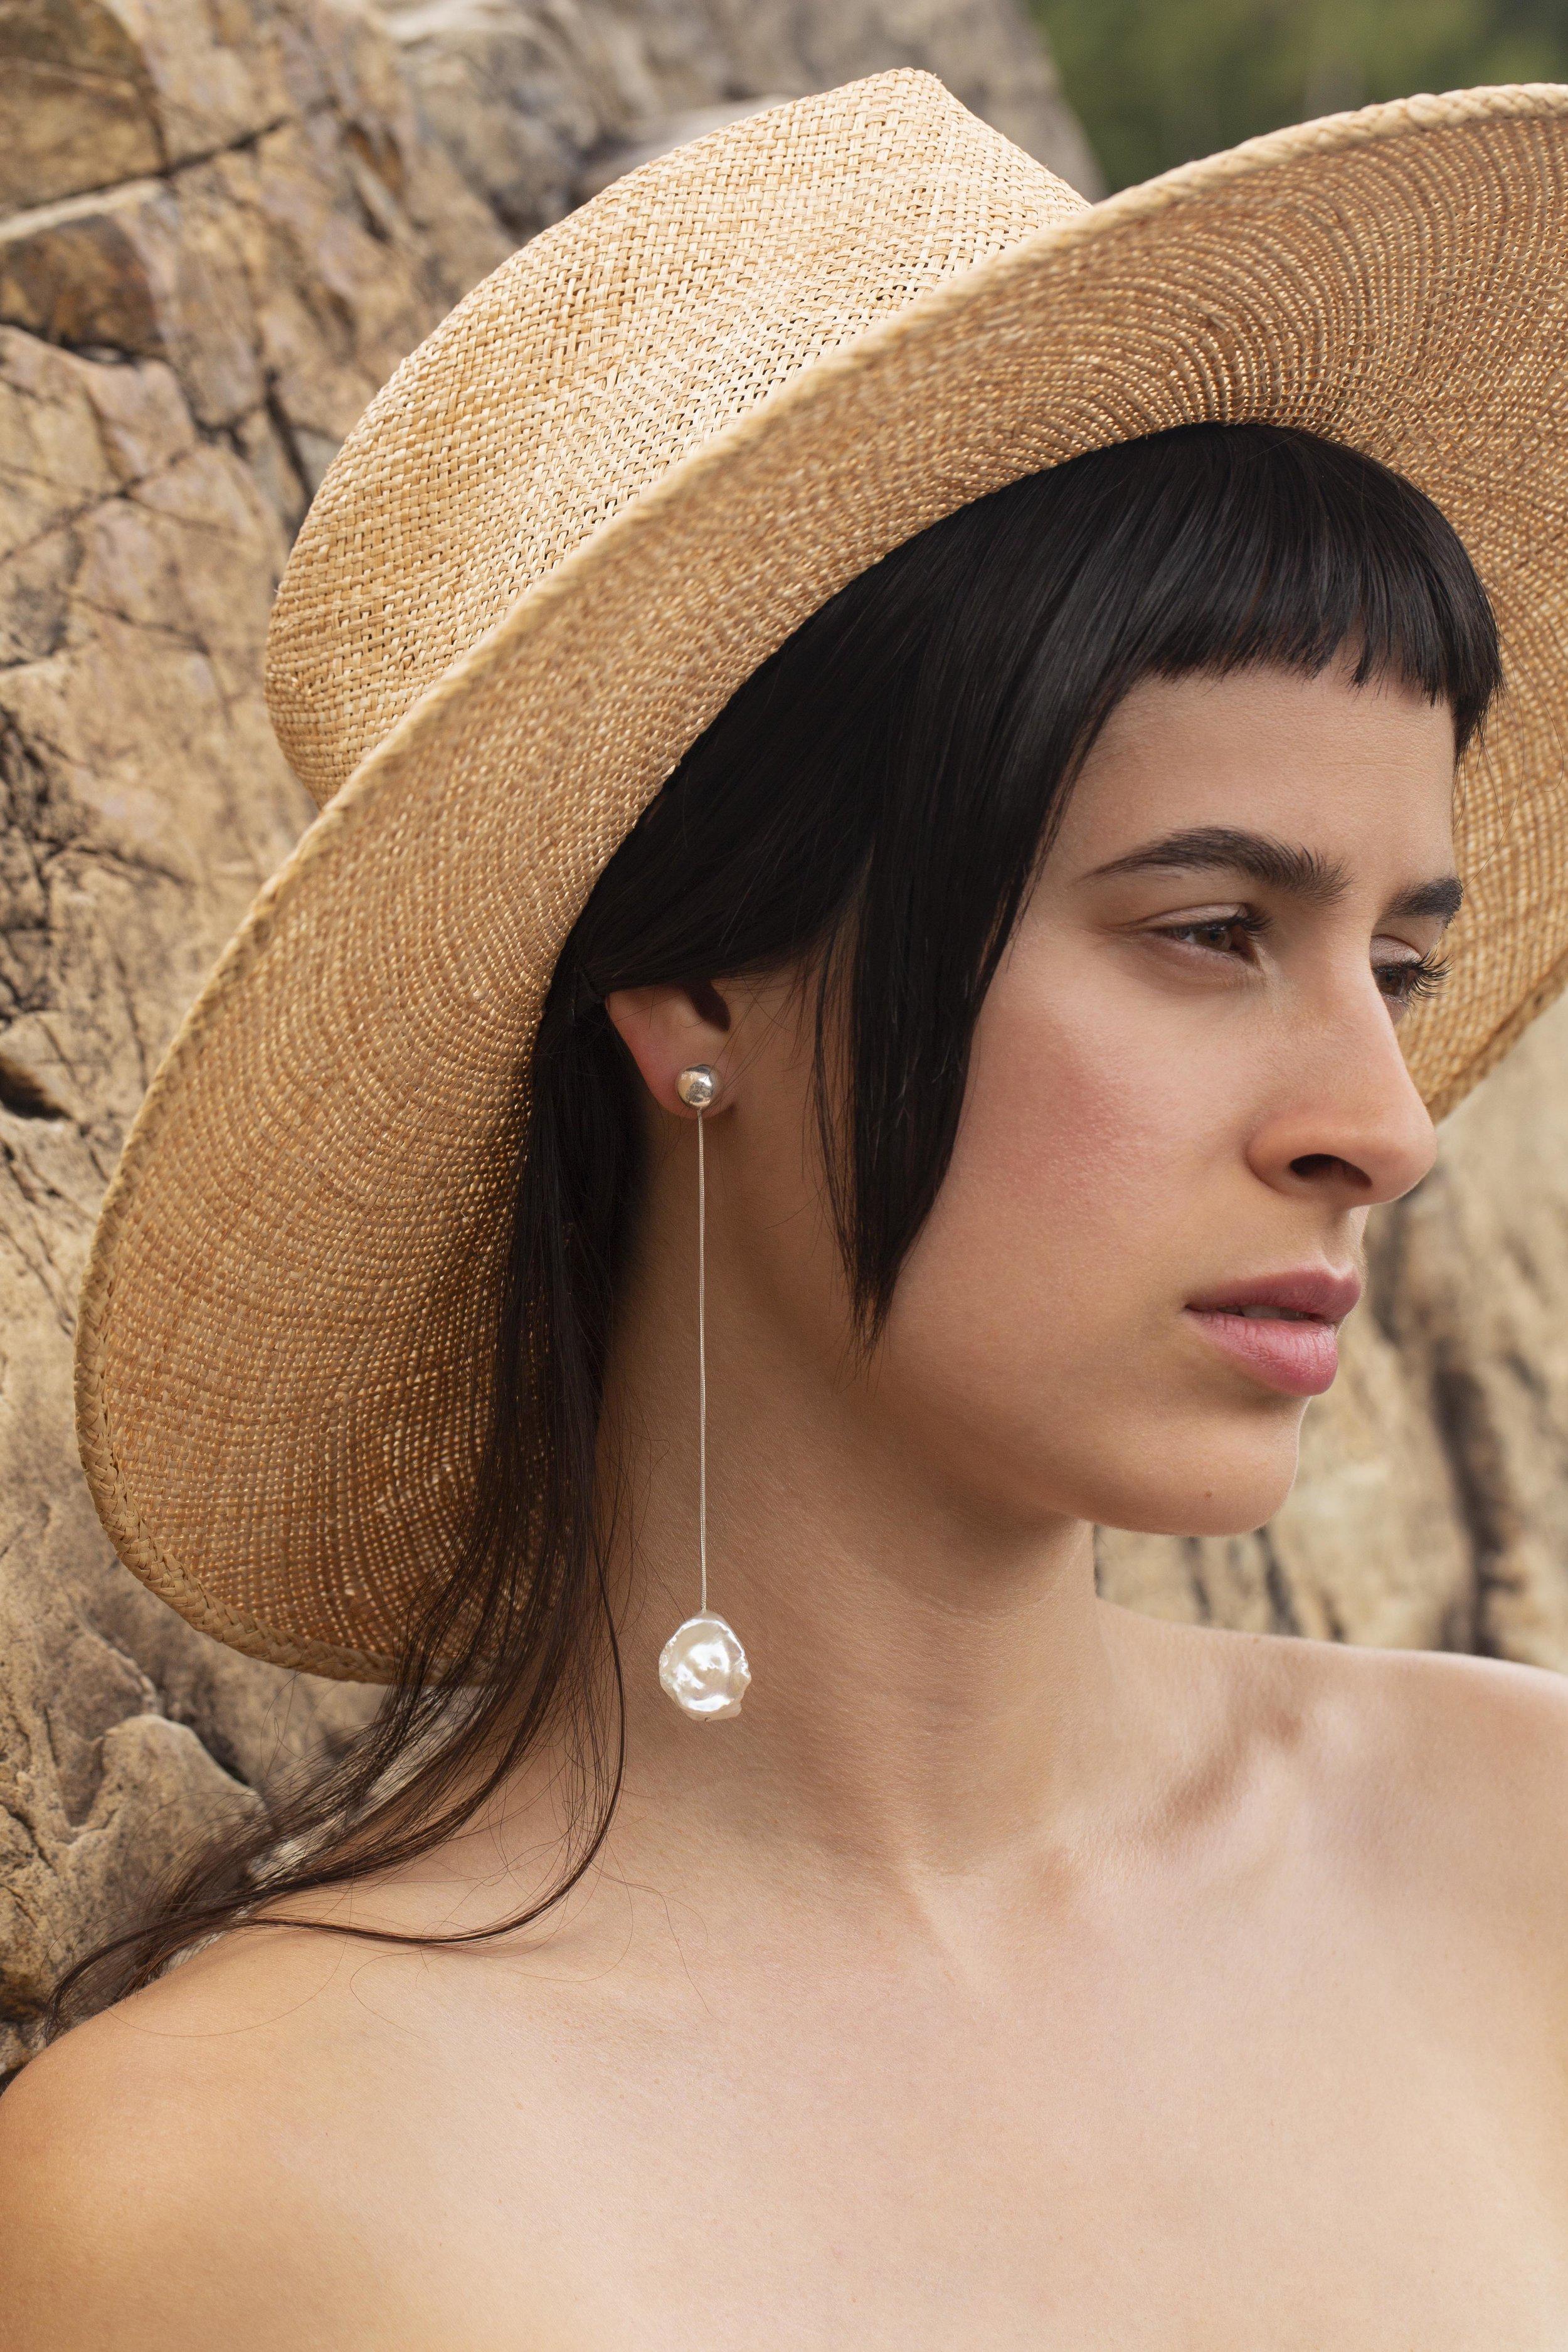 ▲ PISAR earrings